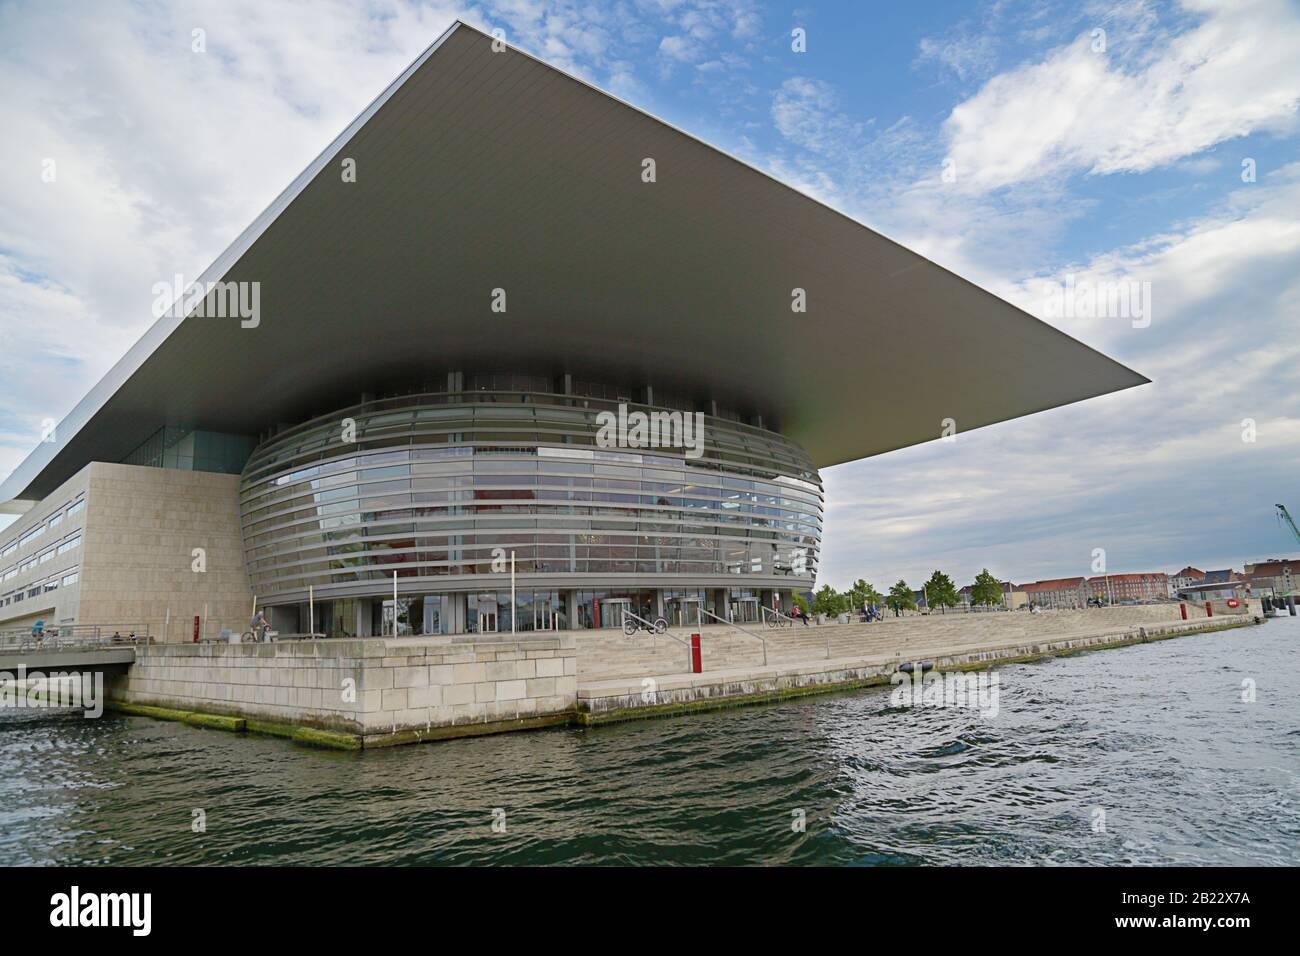 Copenhague, Dinamarca - 14 de junio de 2019: La Ópera de Copenhague, la ópera nacional de Dinamarca Foto de stock